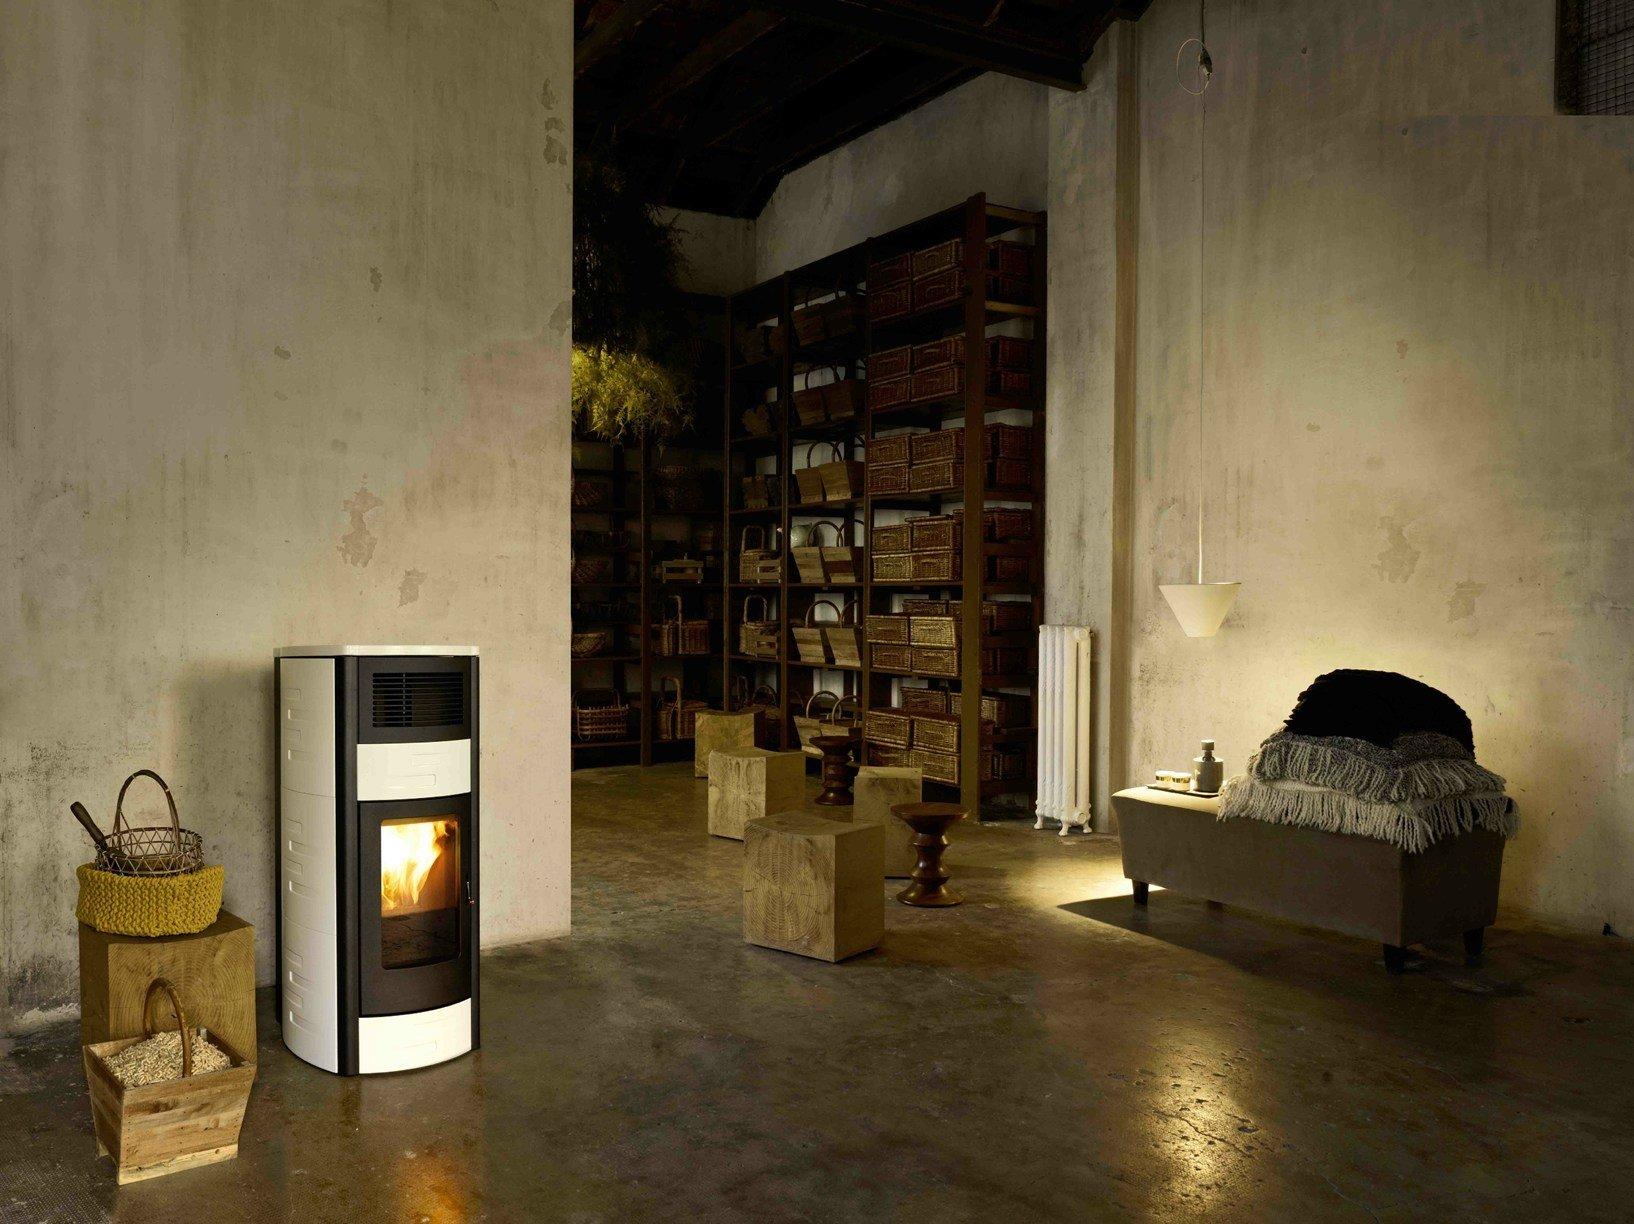 Mcz group alla fiera casa moderna di udine for Casa moderna udine